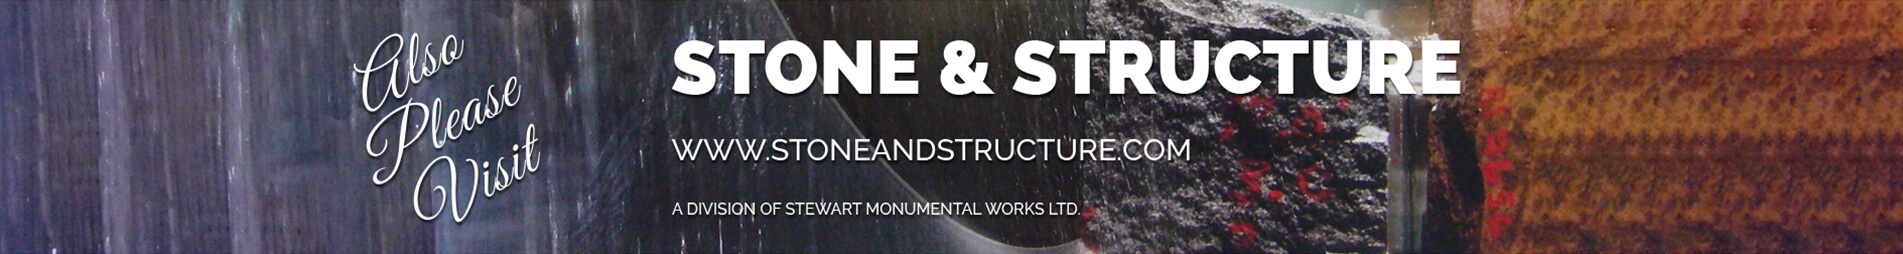 http://www.soundandstructure.com